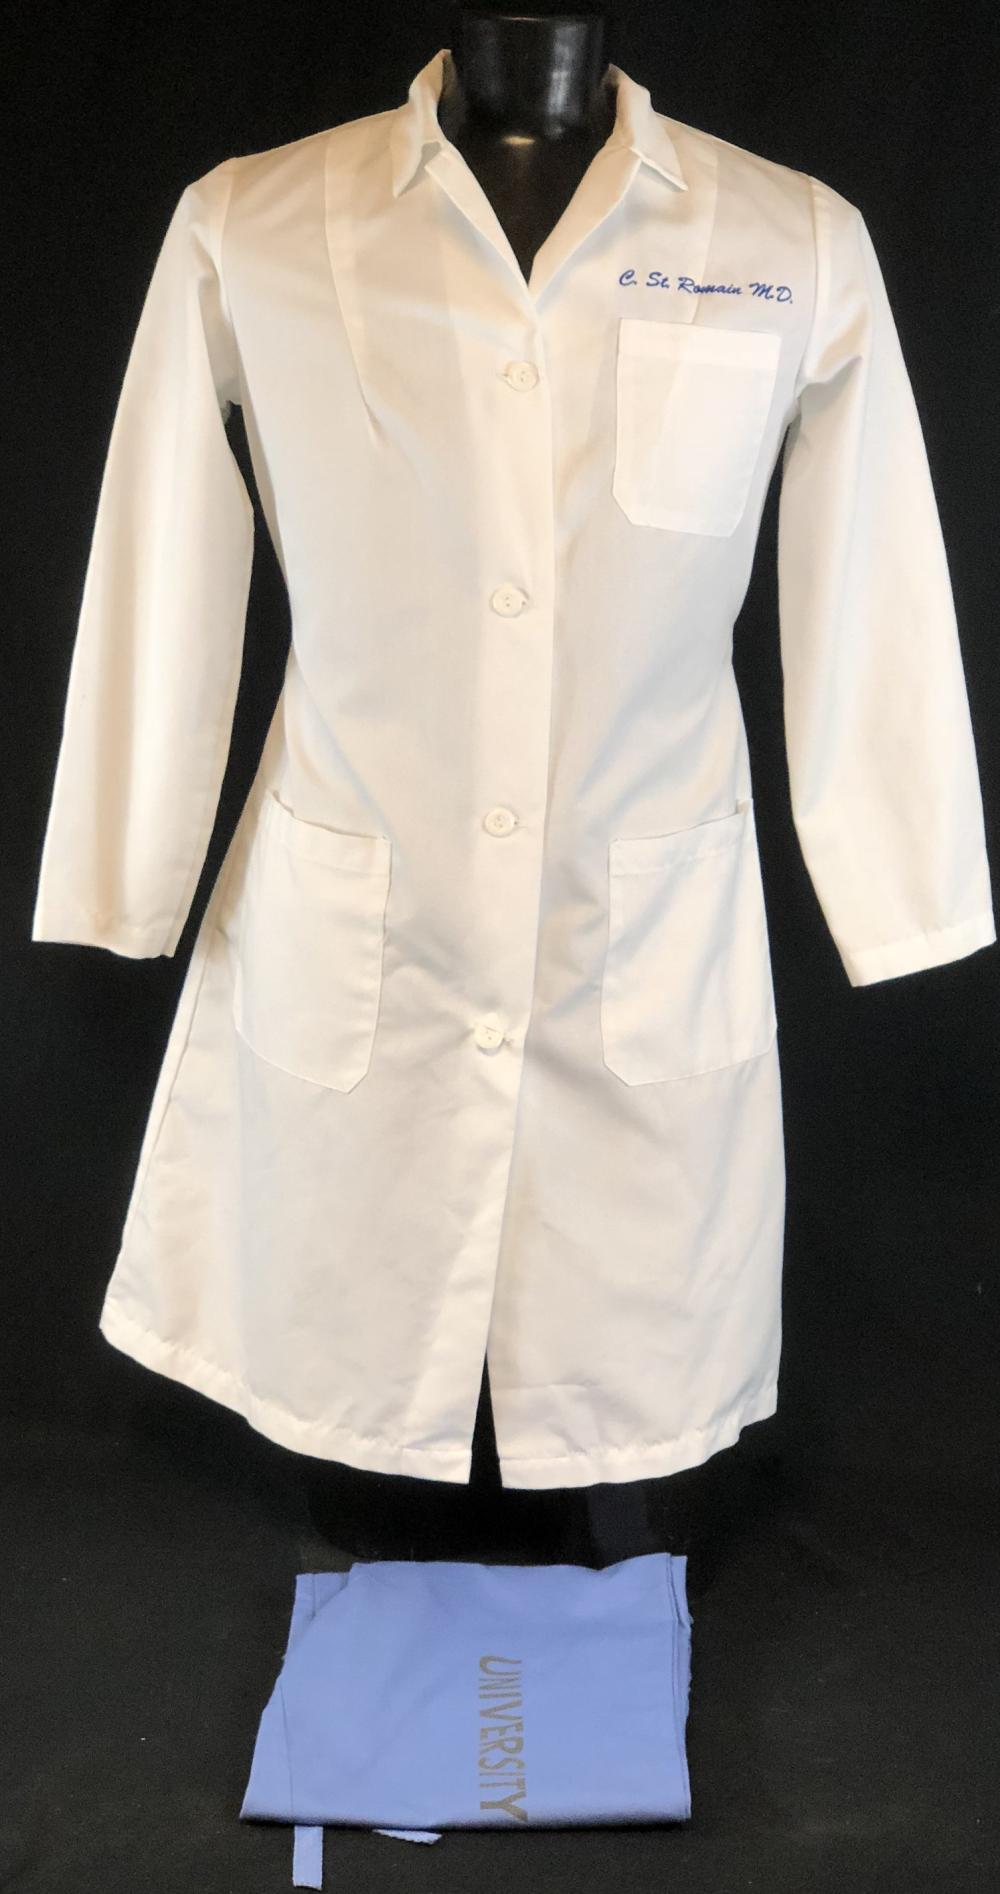 "ER (1994–2009) - ""C. ST. Romain M.D."" Lab Coat & Scrub Bottoms"